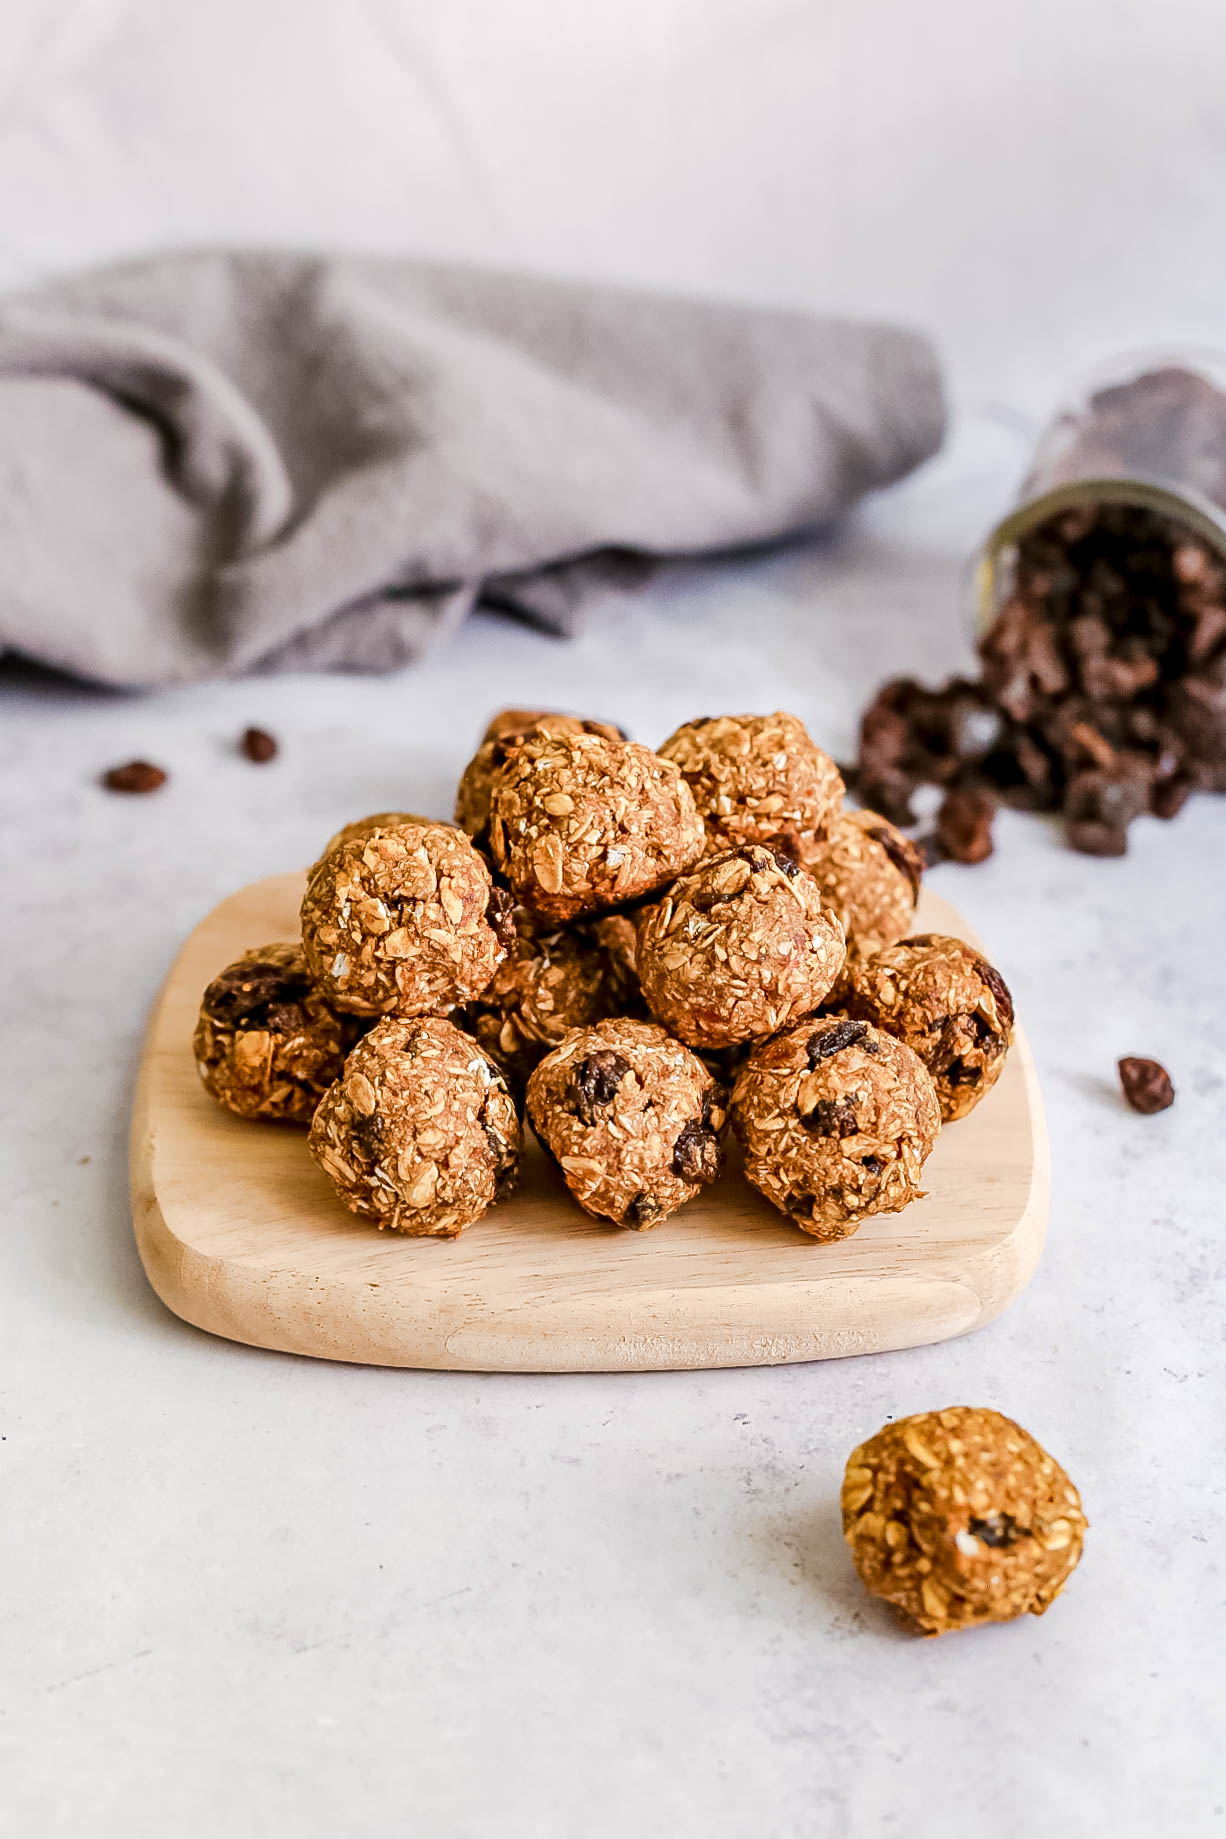 Oatmeal Raisin Cookie Bites